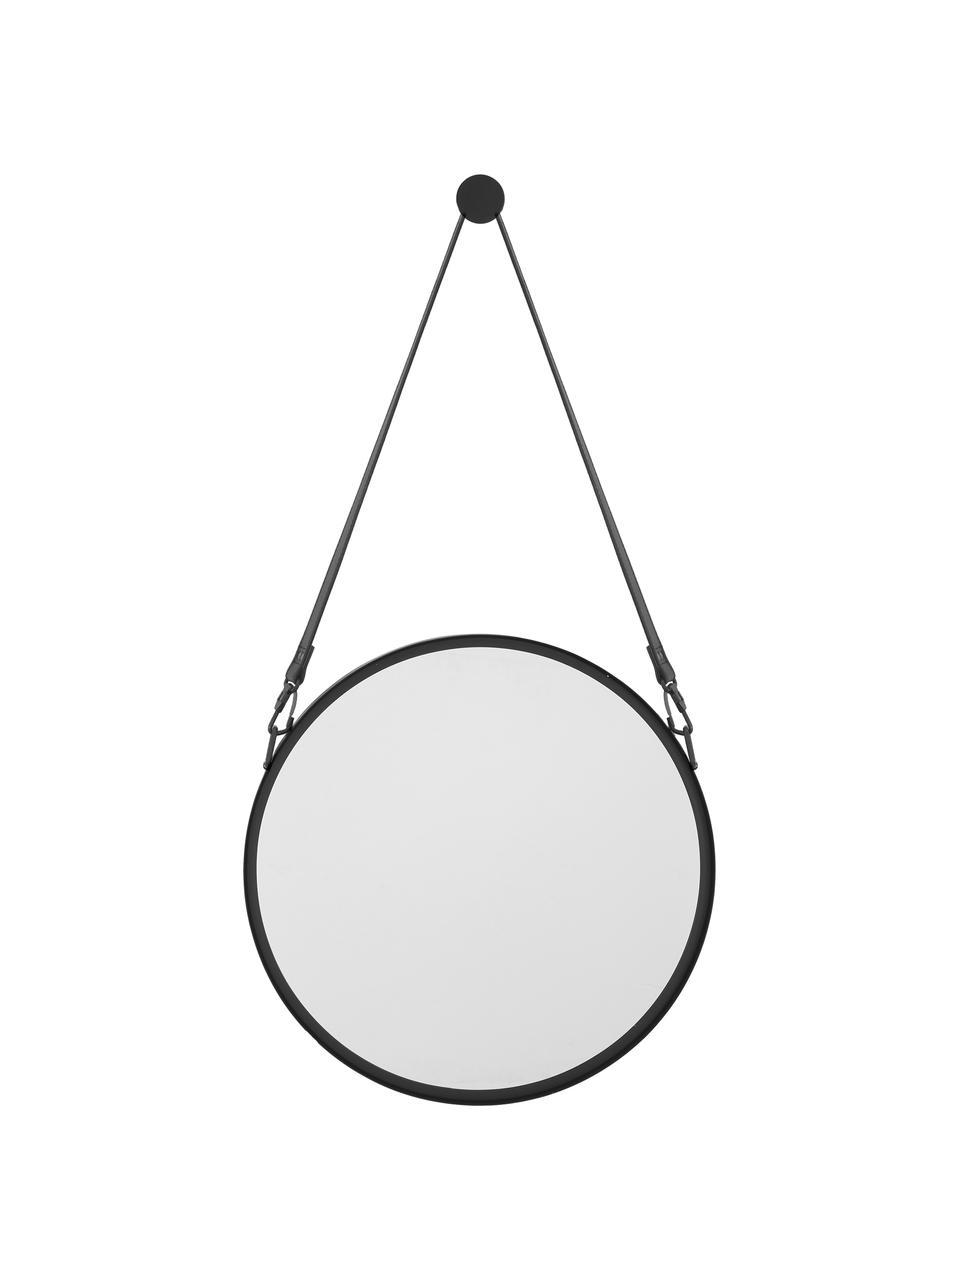 Ronde wandspiegel Liz met zwart leren ophangband, Zwart, Ø 60 cm